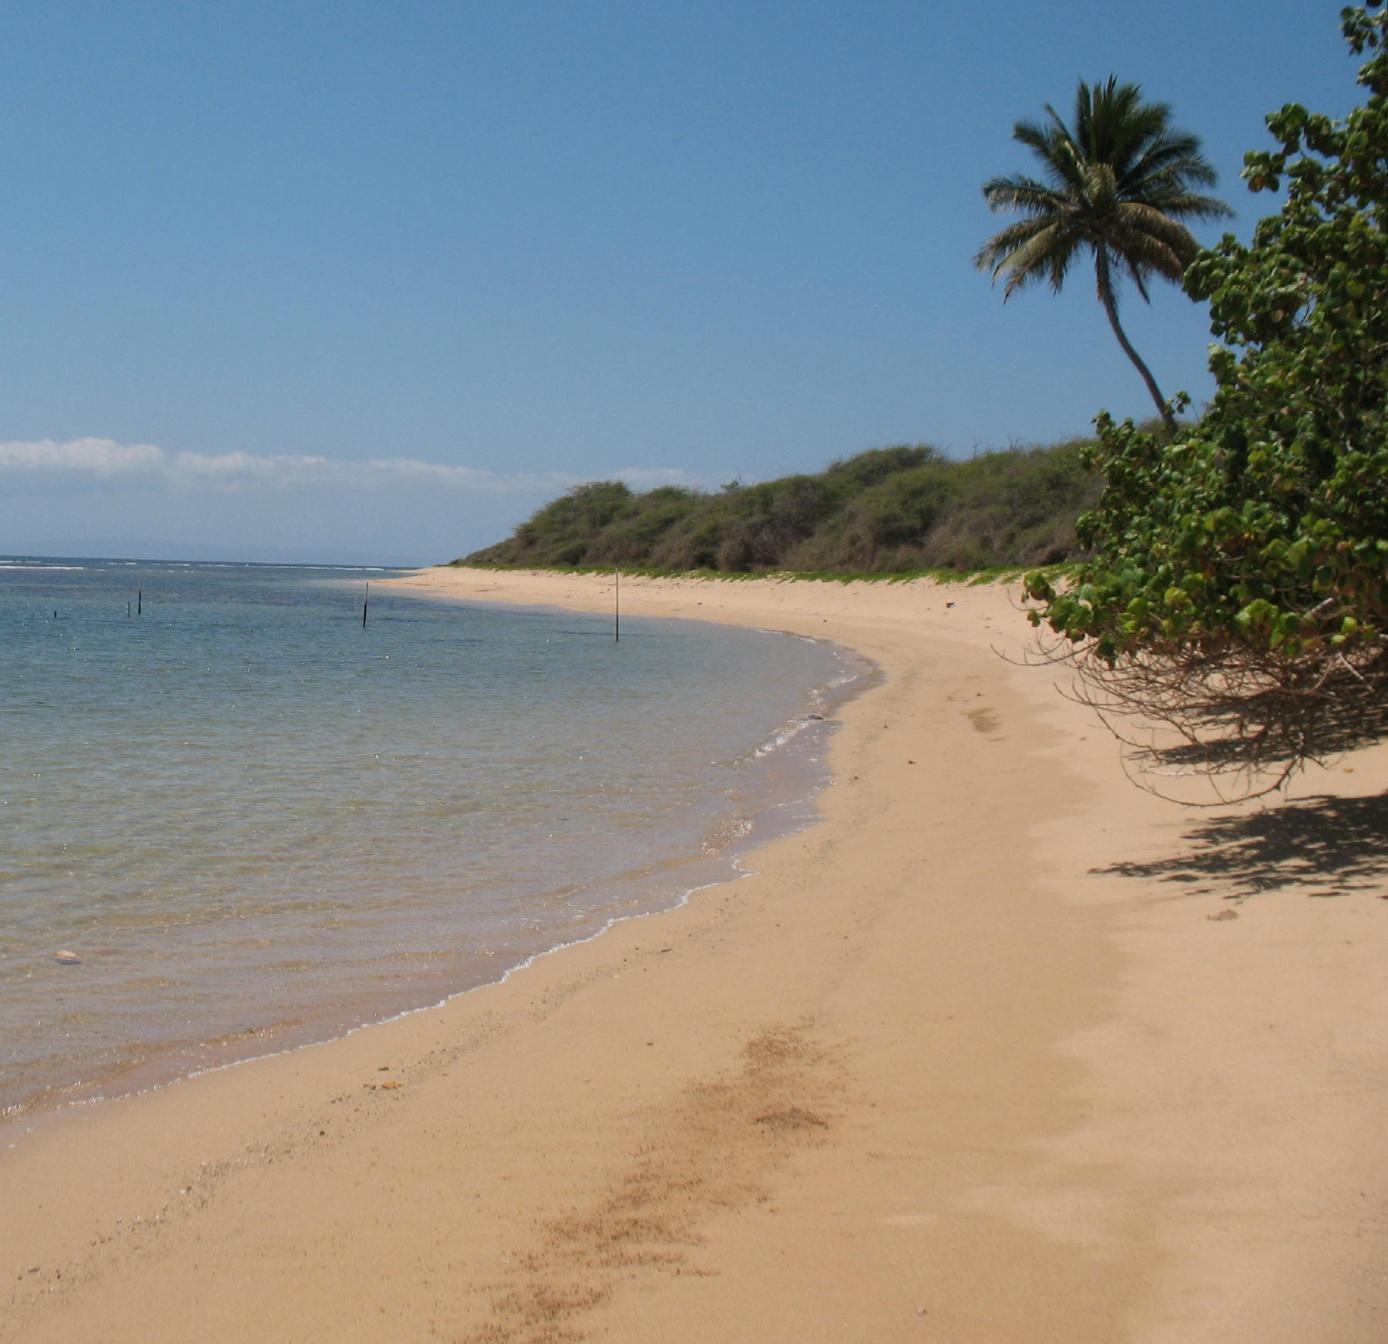 Click image for larger version  Name:Lanai Club Beach.jpg Views:179 Size:424.2 KB ID:41534